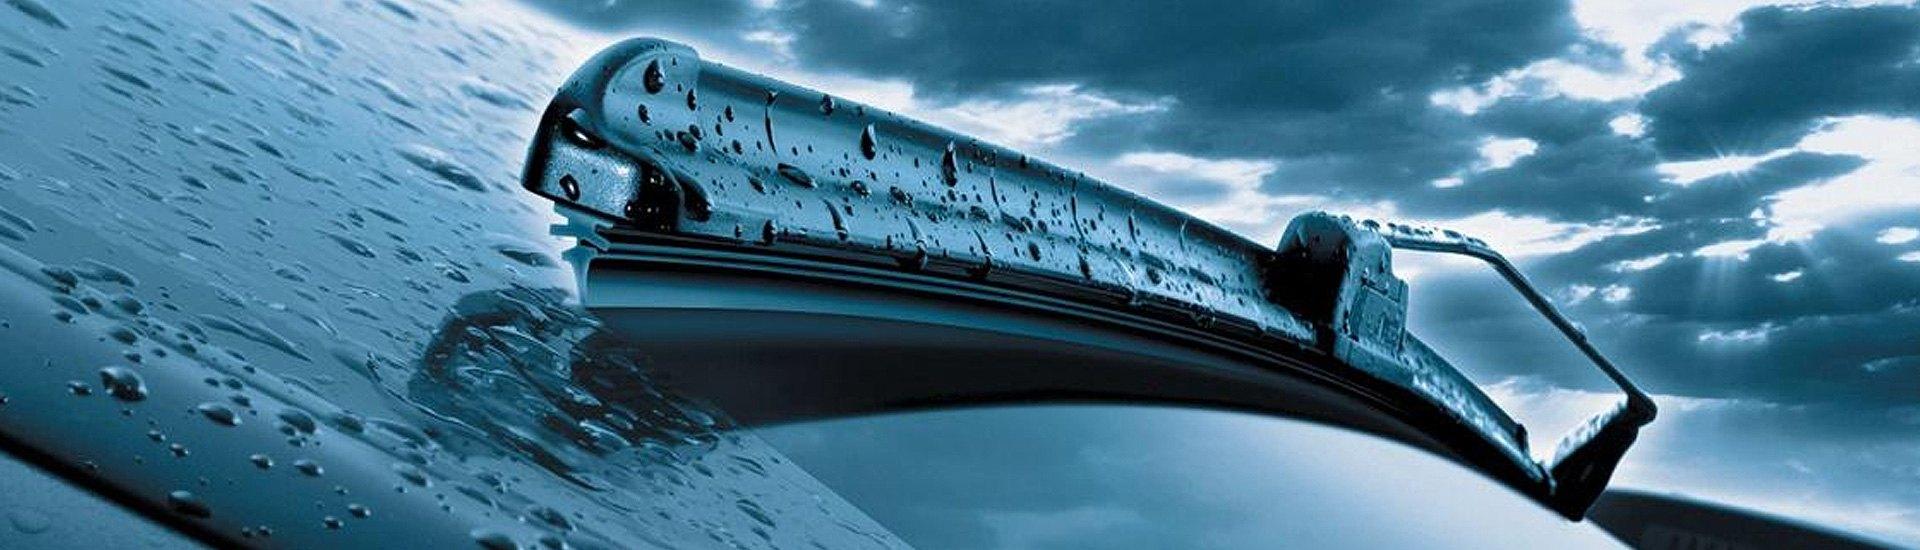 lexus windshield wipers winter mode